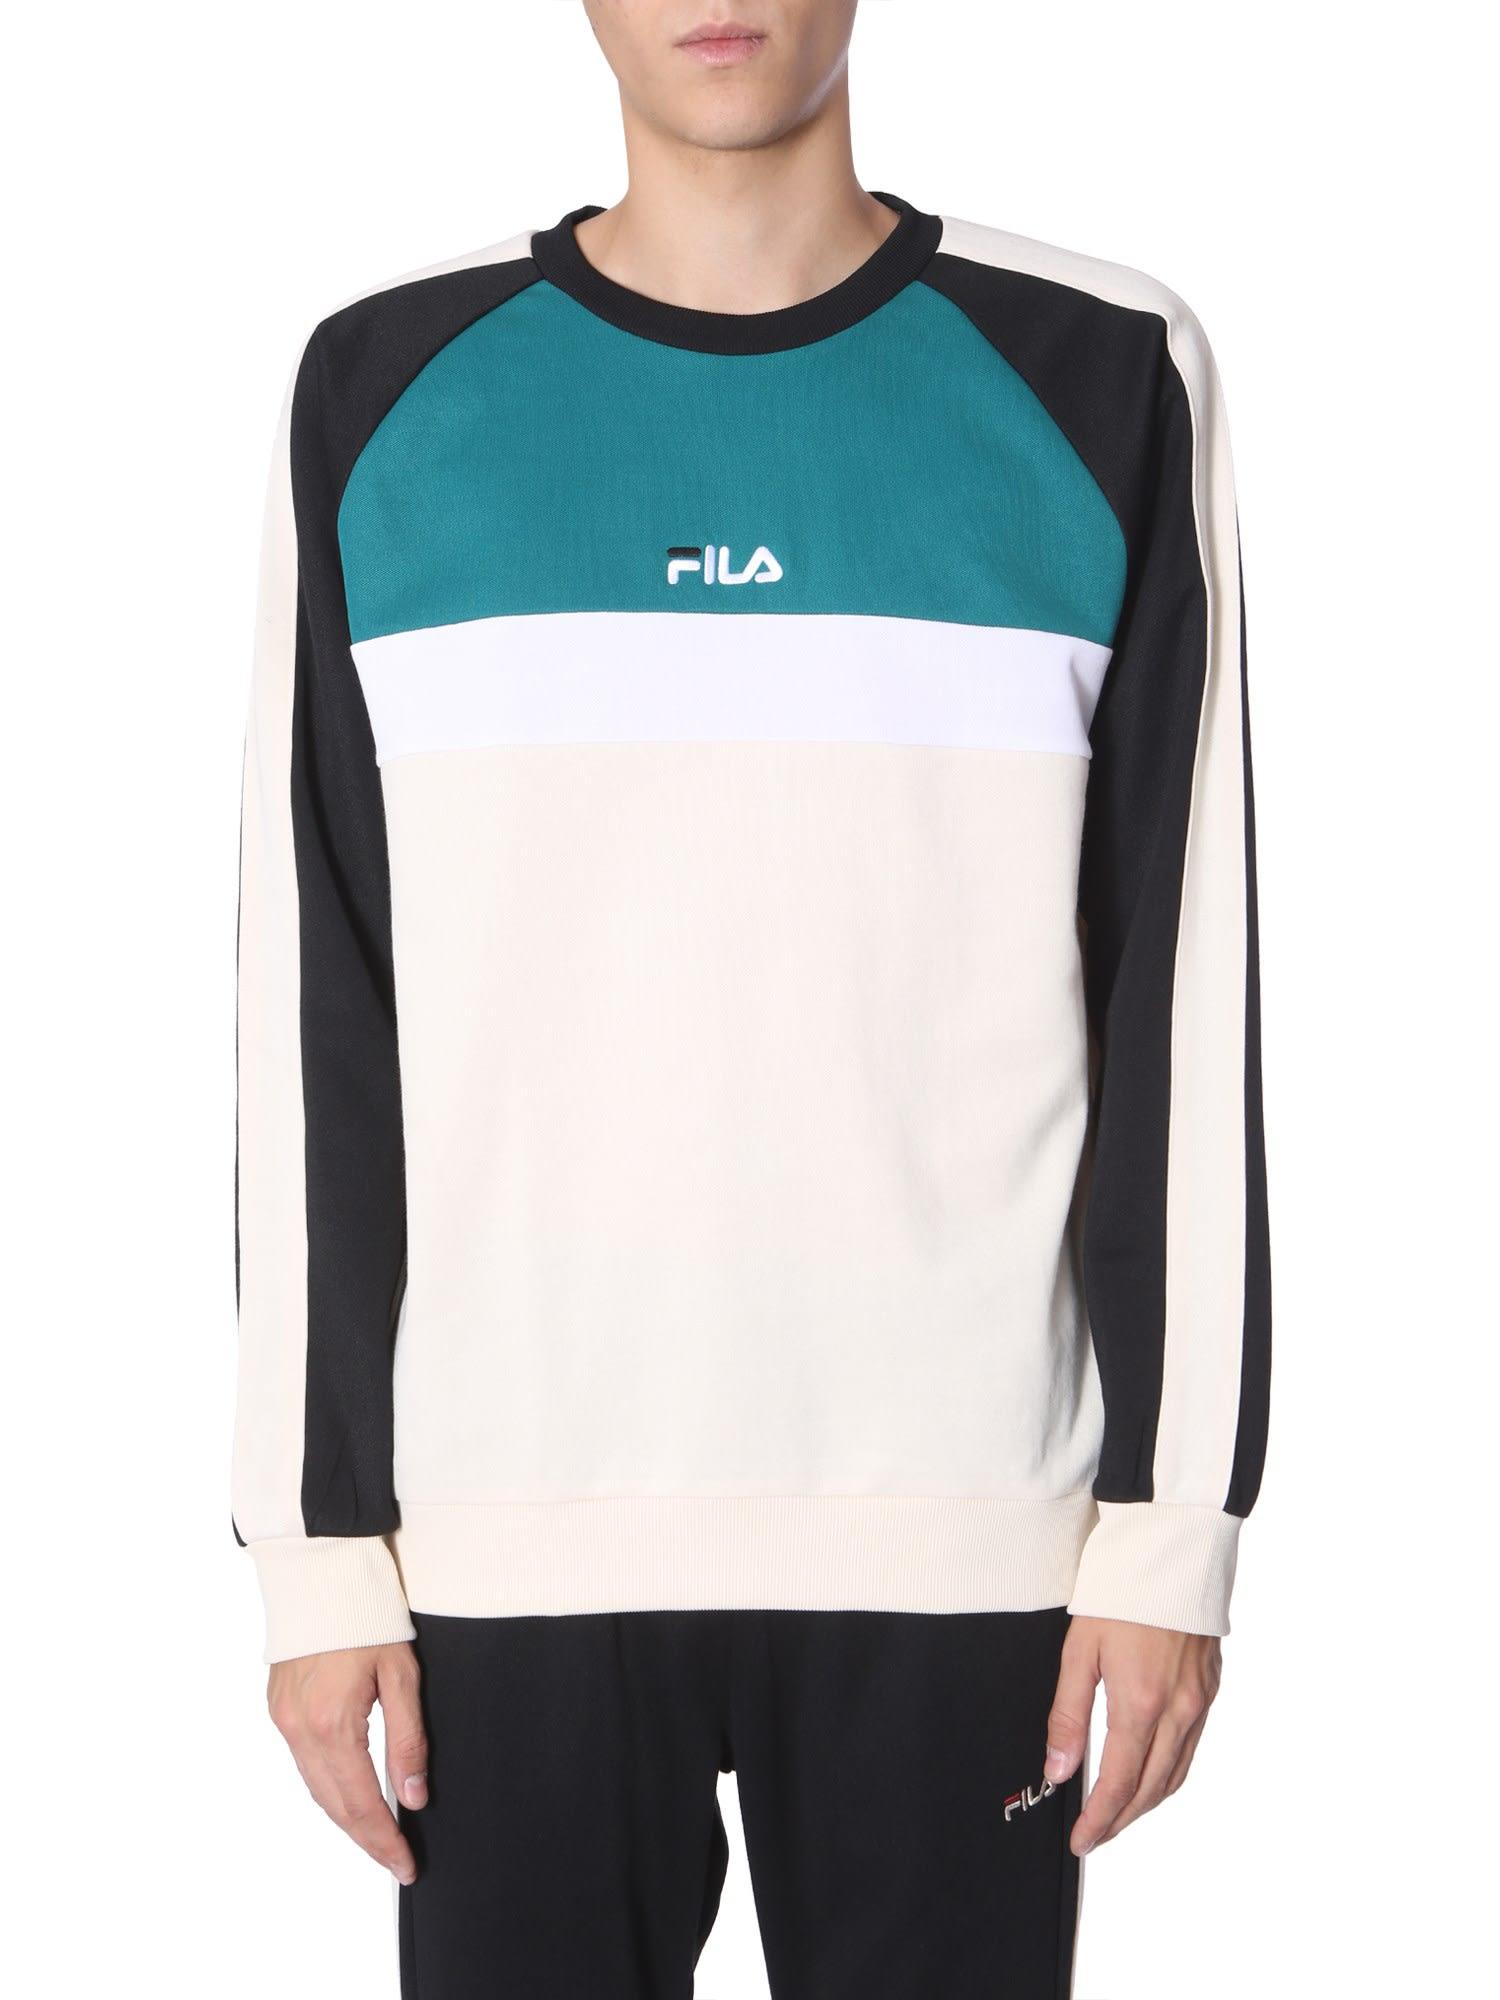 Fila Crew Neck Sweatshirt